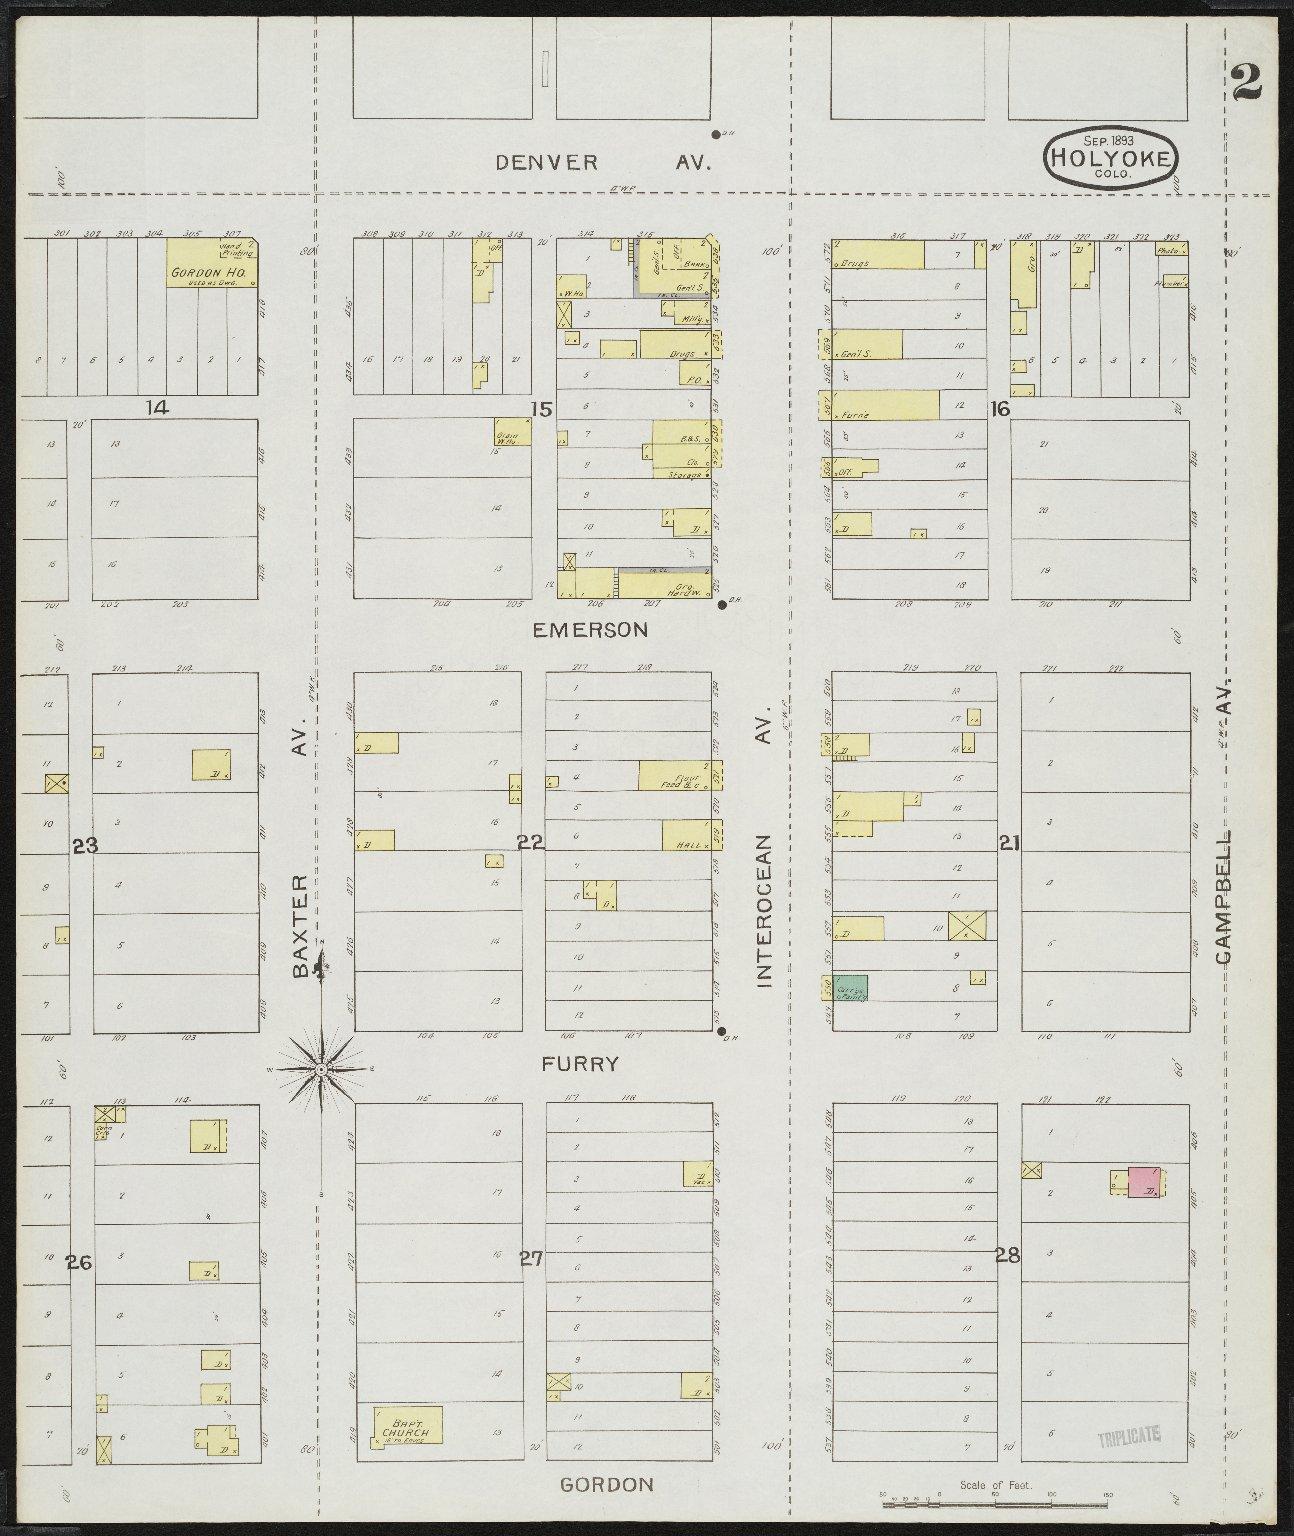 Holyoke, Phillips Co., Col.